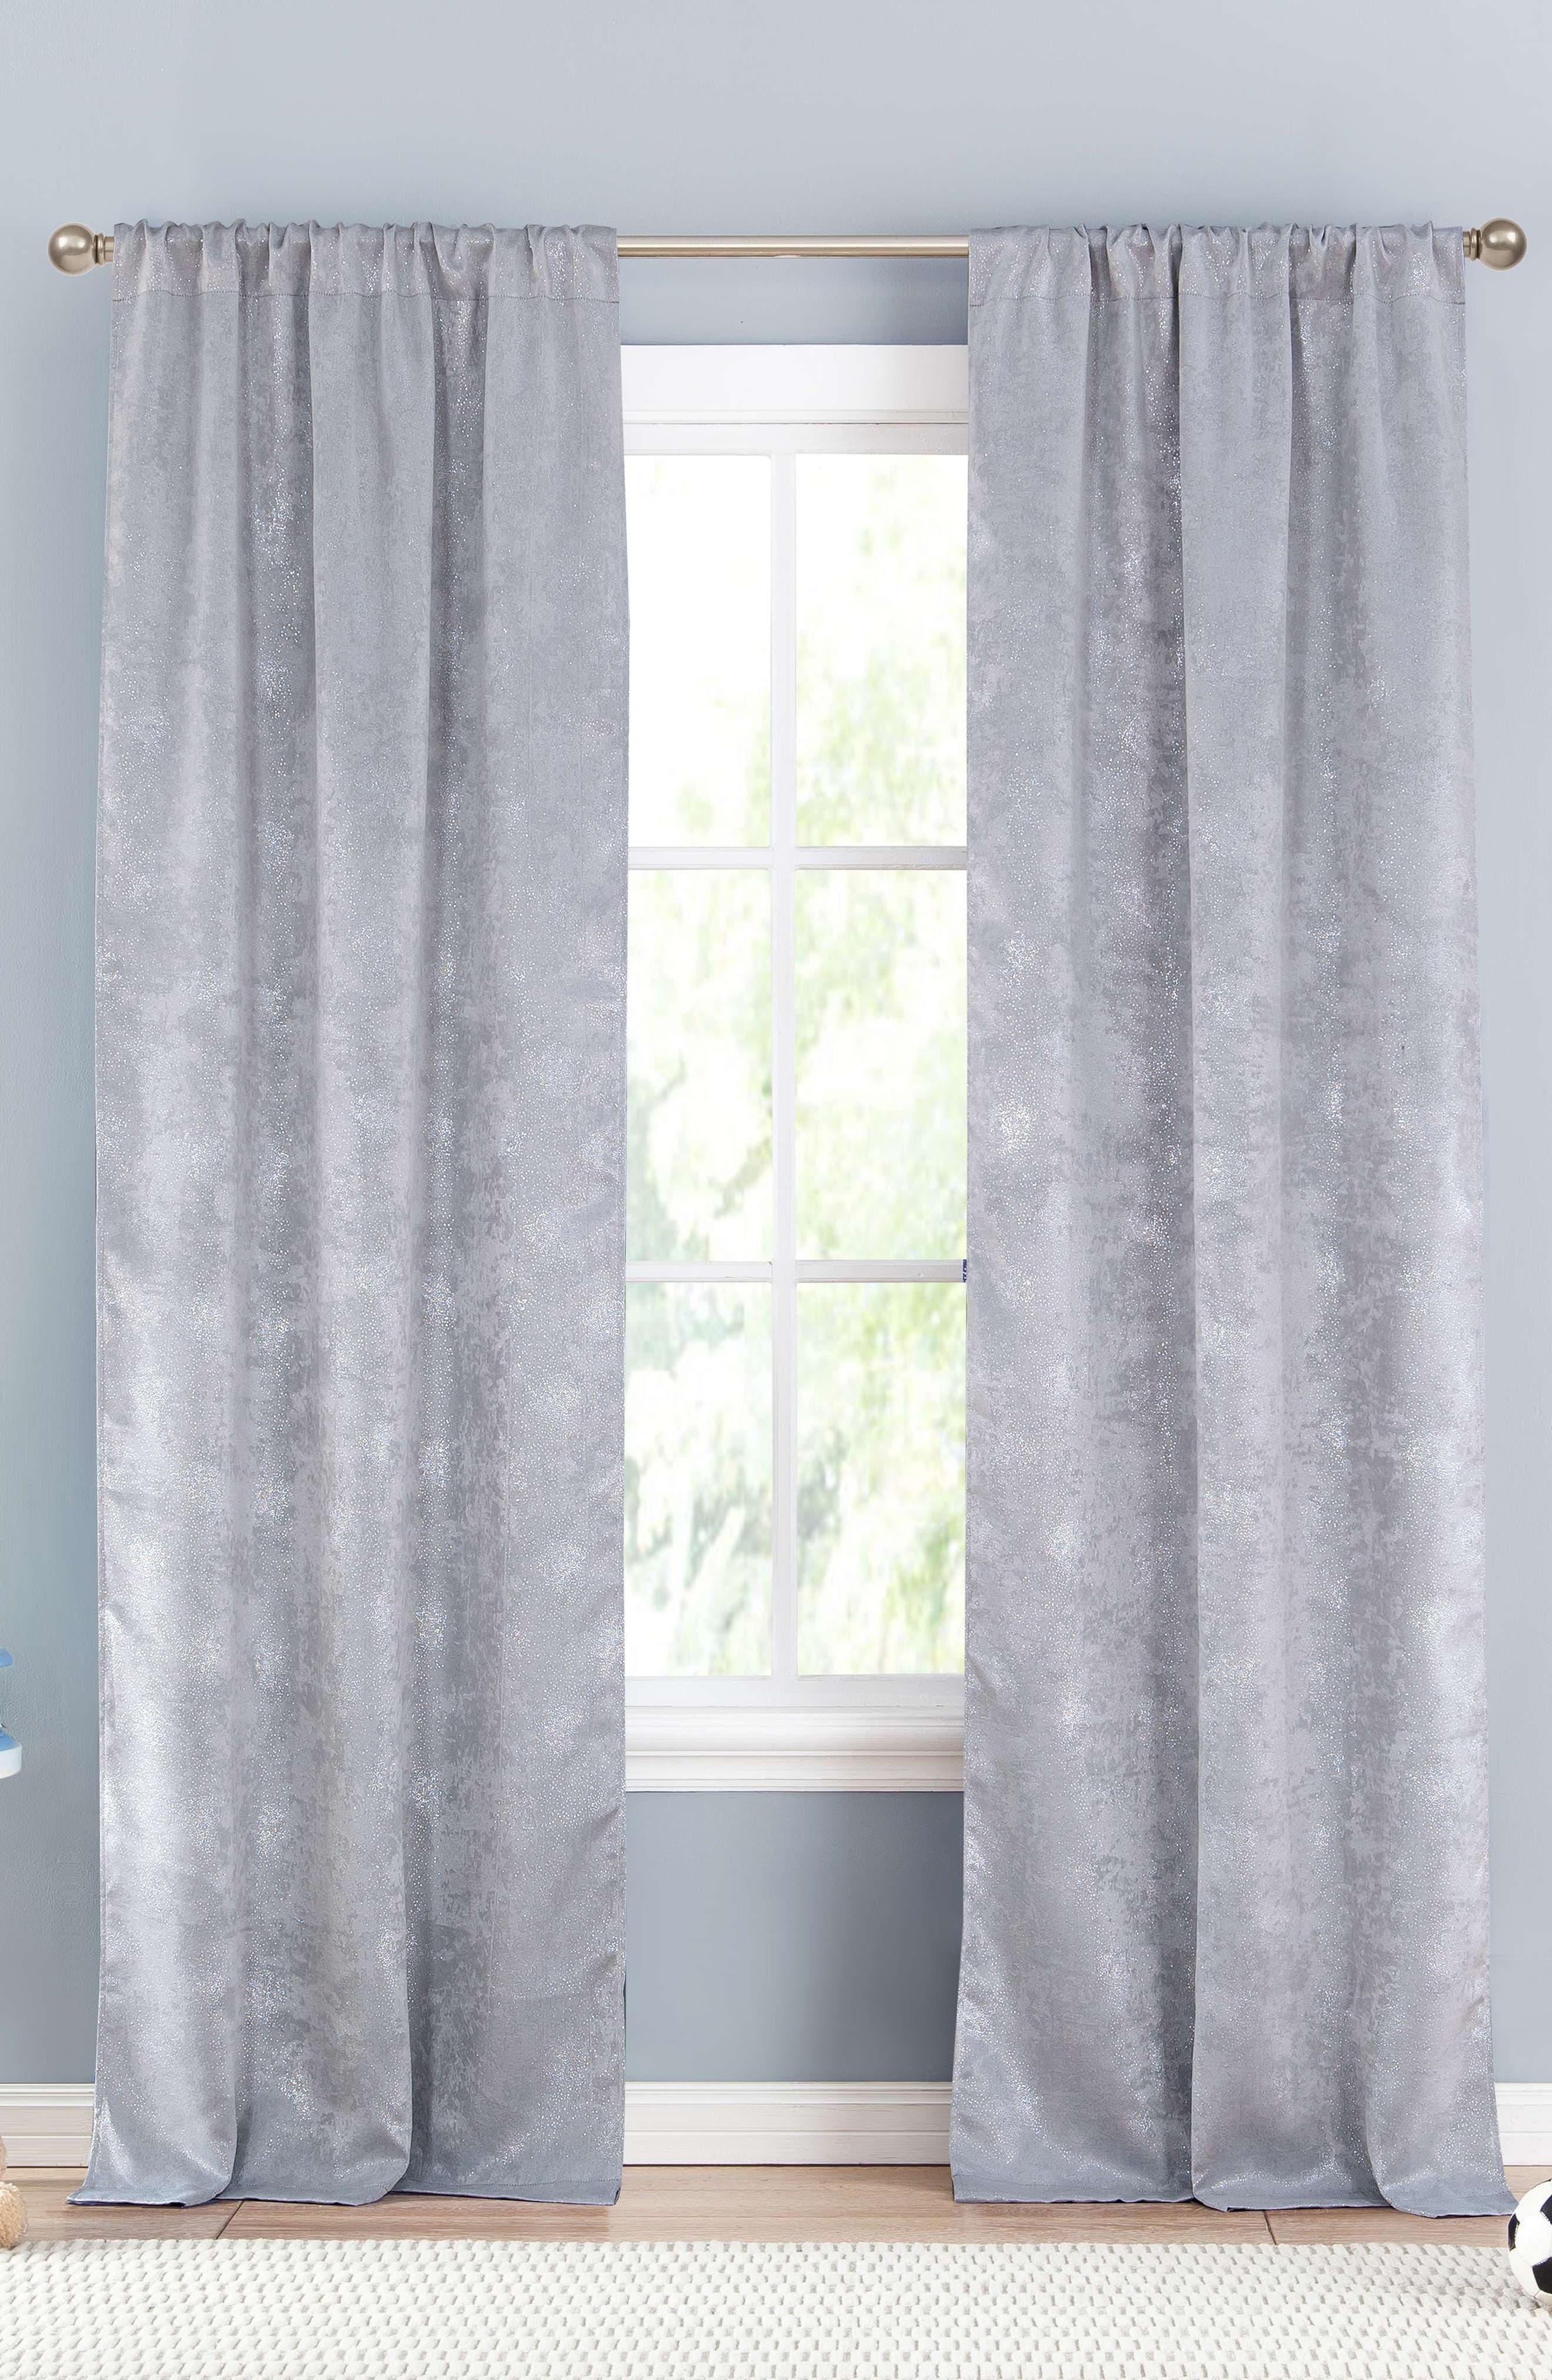 Main Image - LALA + BASH Clarice Metallic Blackout Window Panels